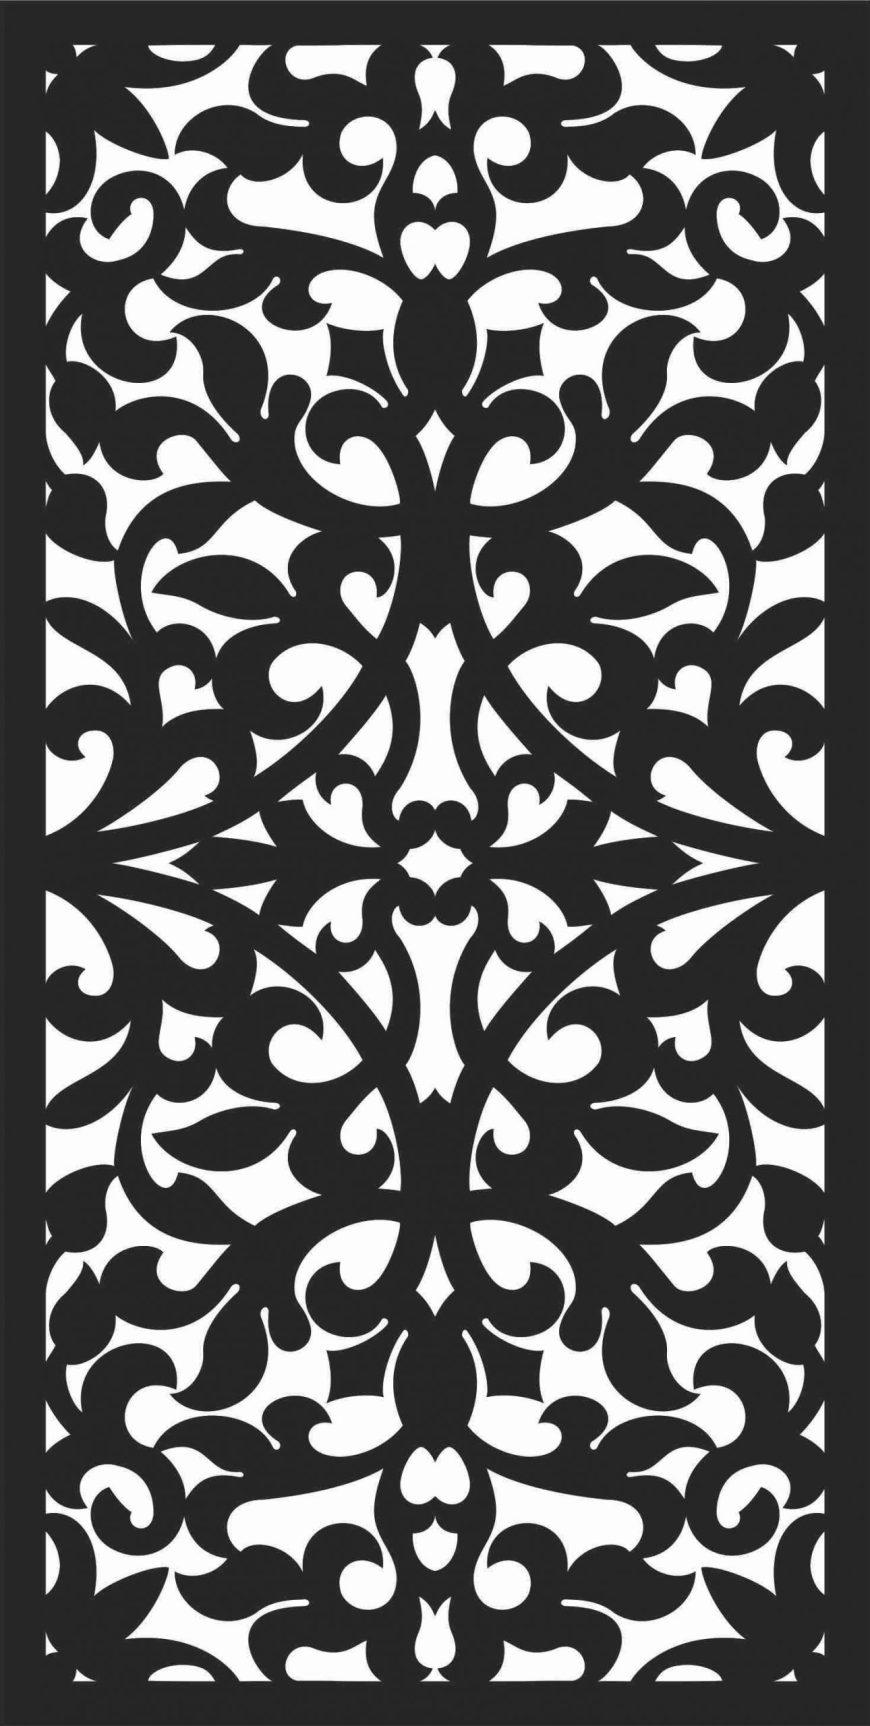 Screen Panel Patterns Seamless 1 Free DXF File